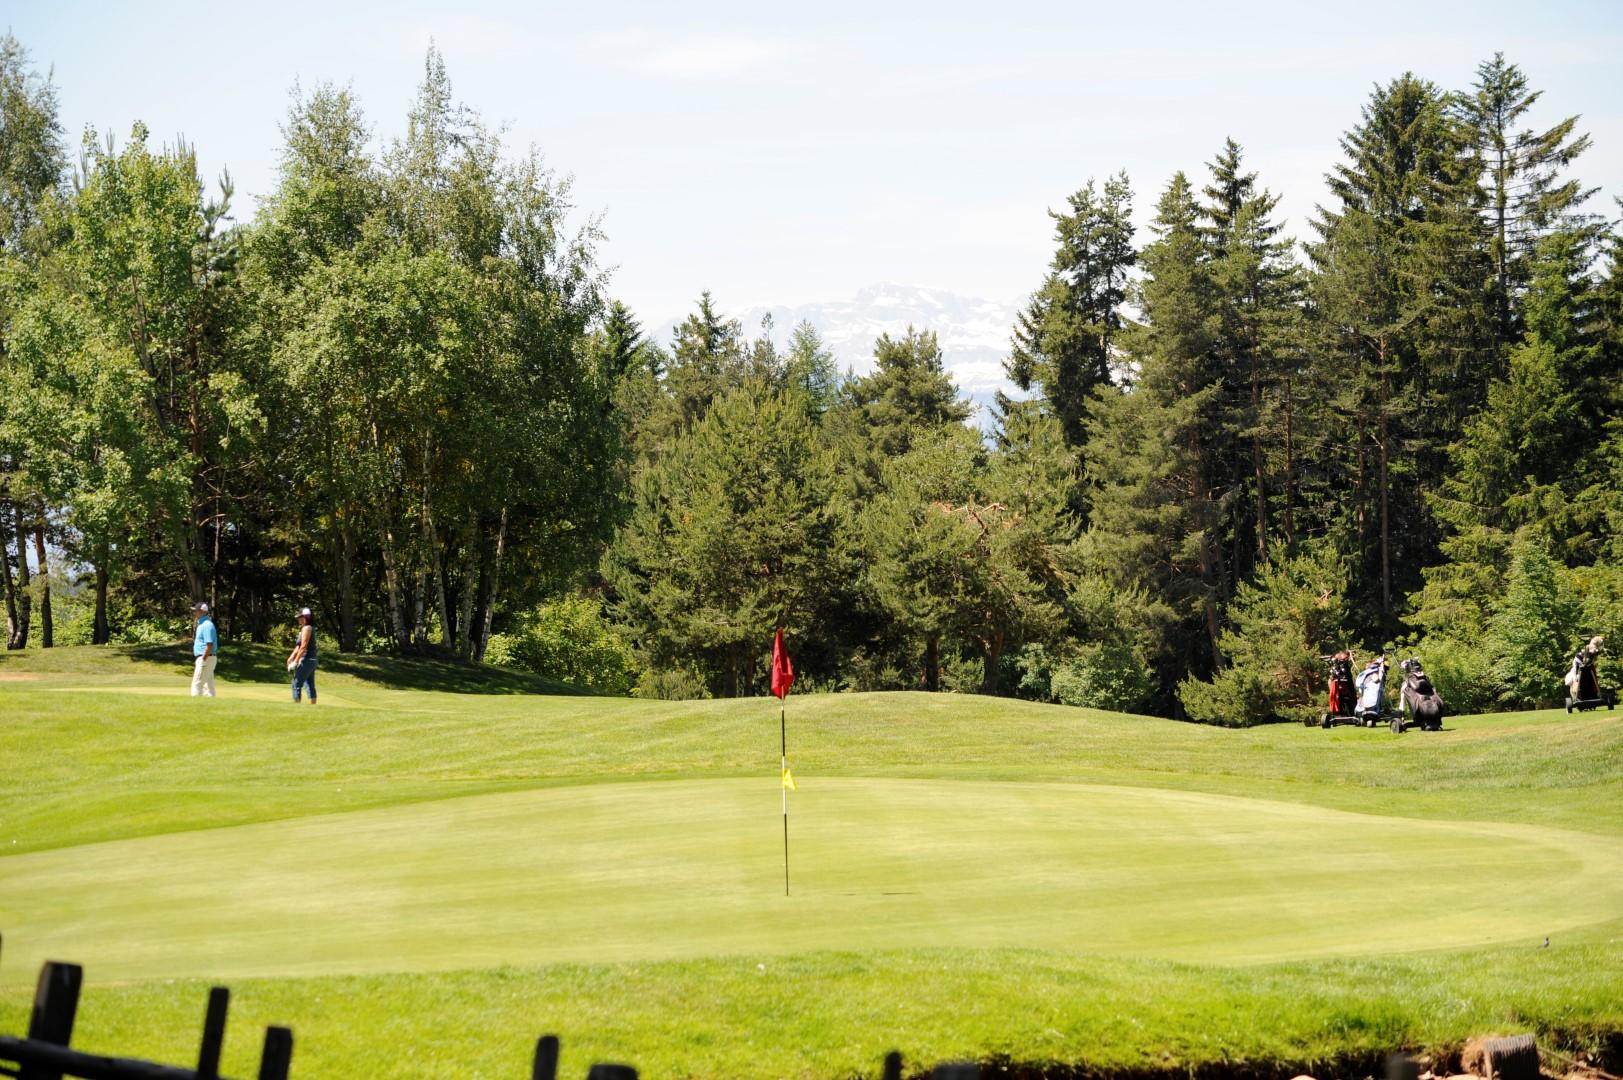 Golfschule DSC2601 Large